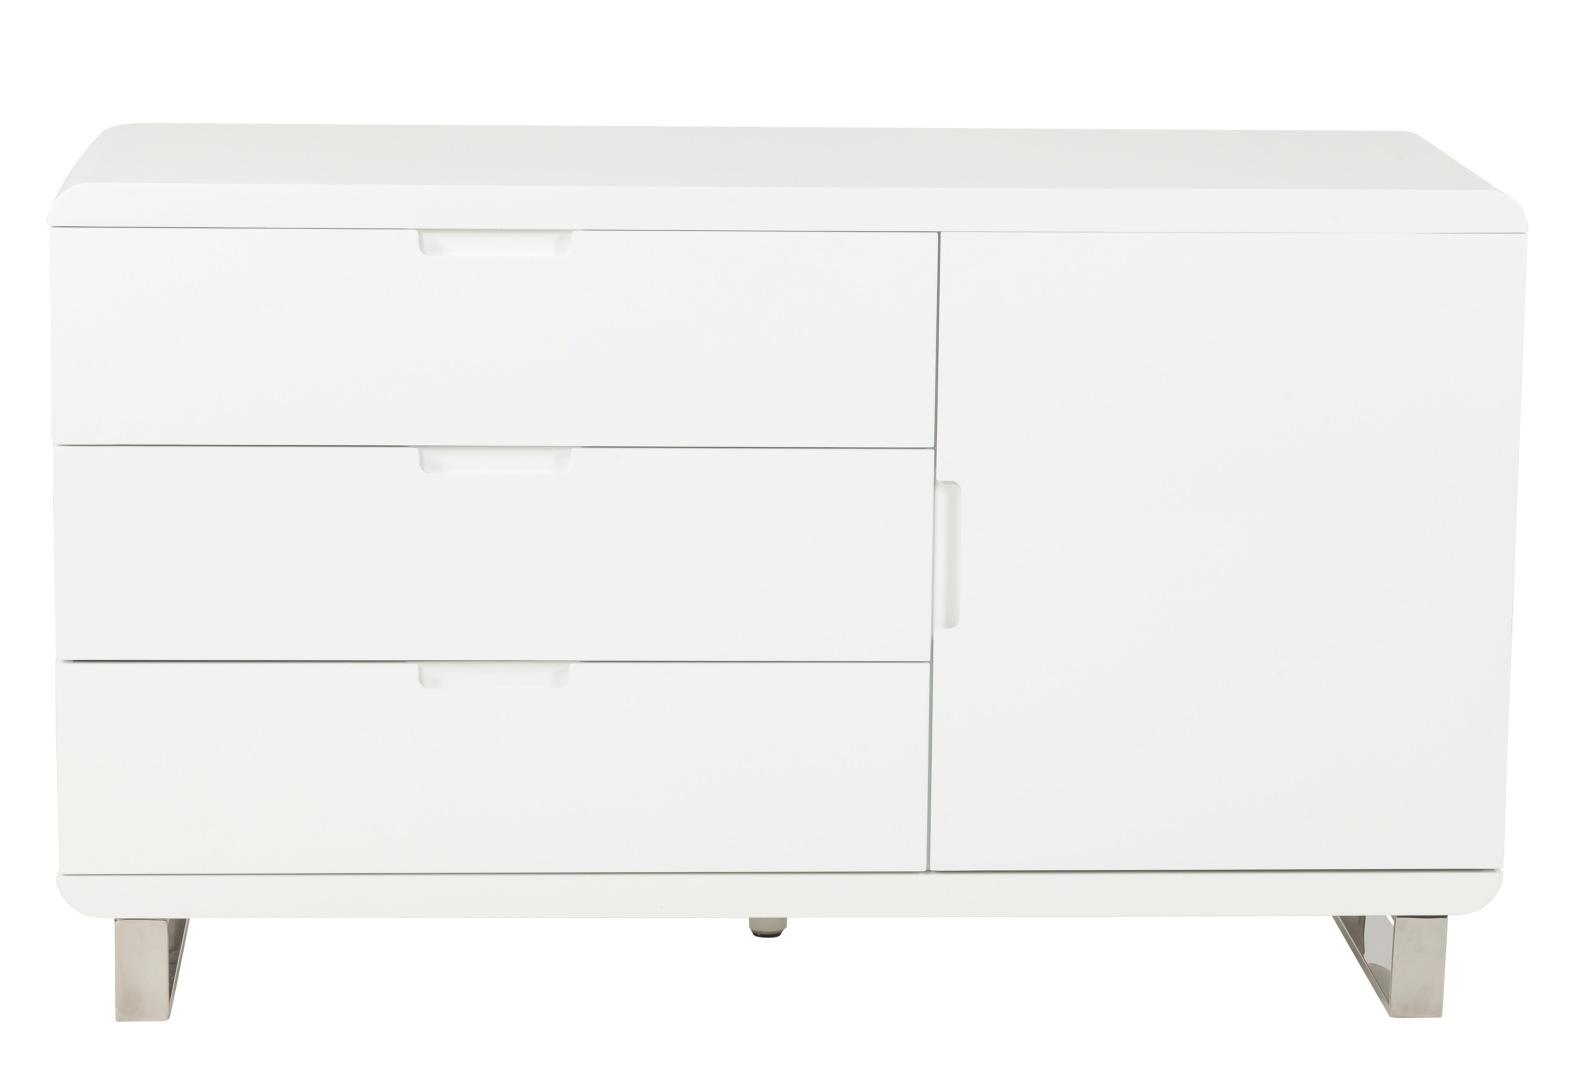 24Designs Dressoir Tindra - 135x45x80 - Wit Hoogglans